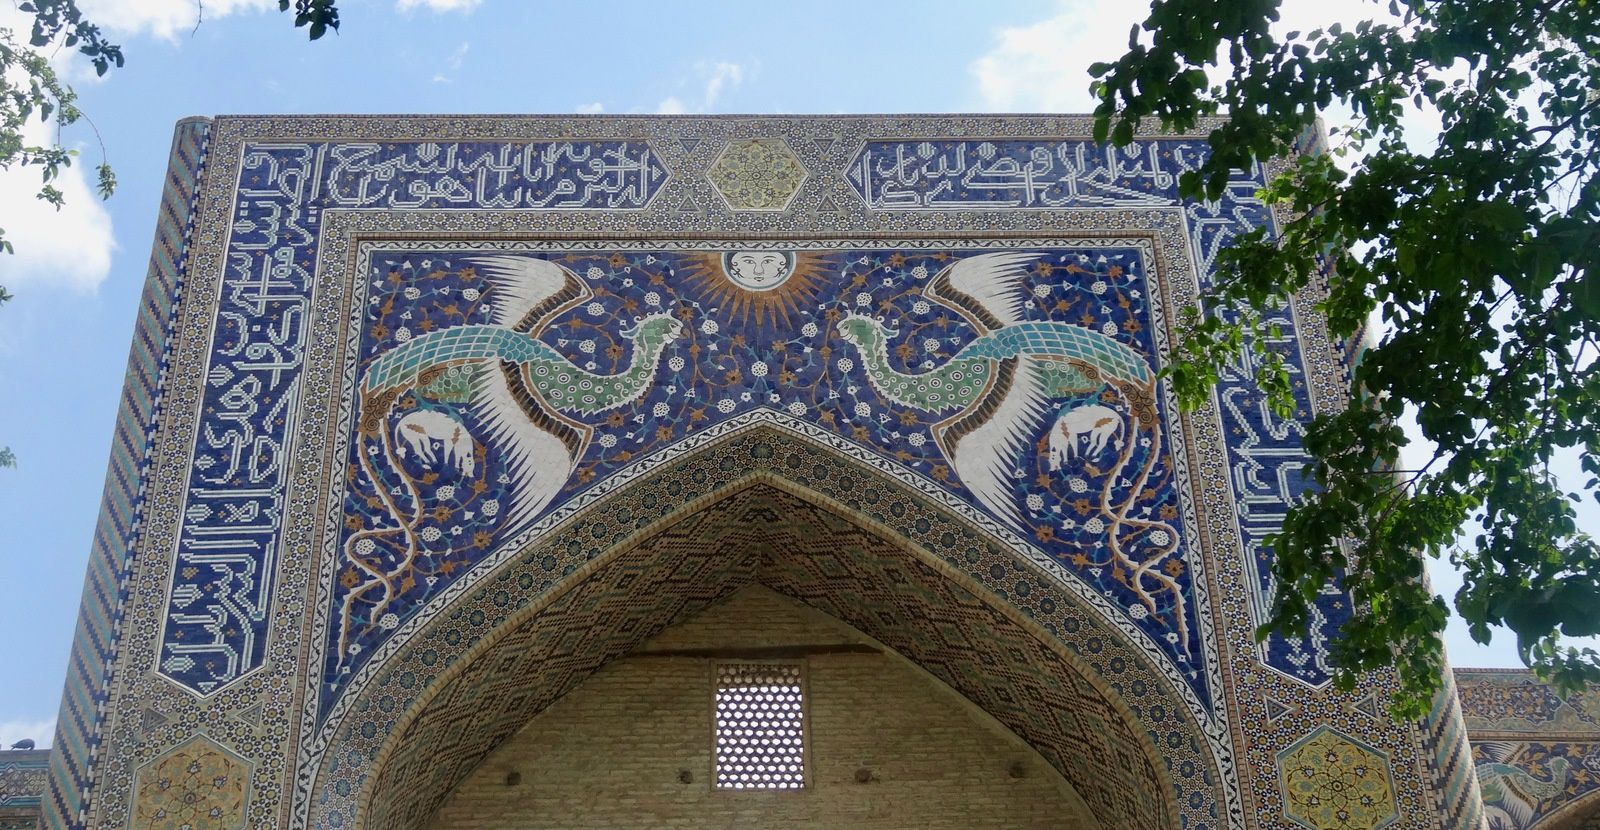 Une semaine en Ouzbékistan - 2 : Boukhara - Samarcande - Tashkent